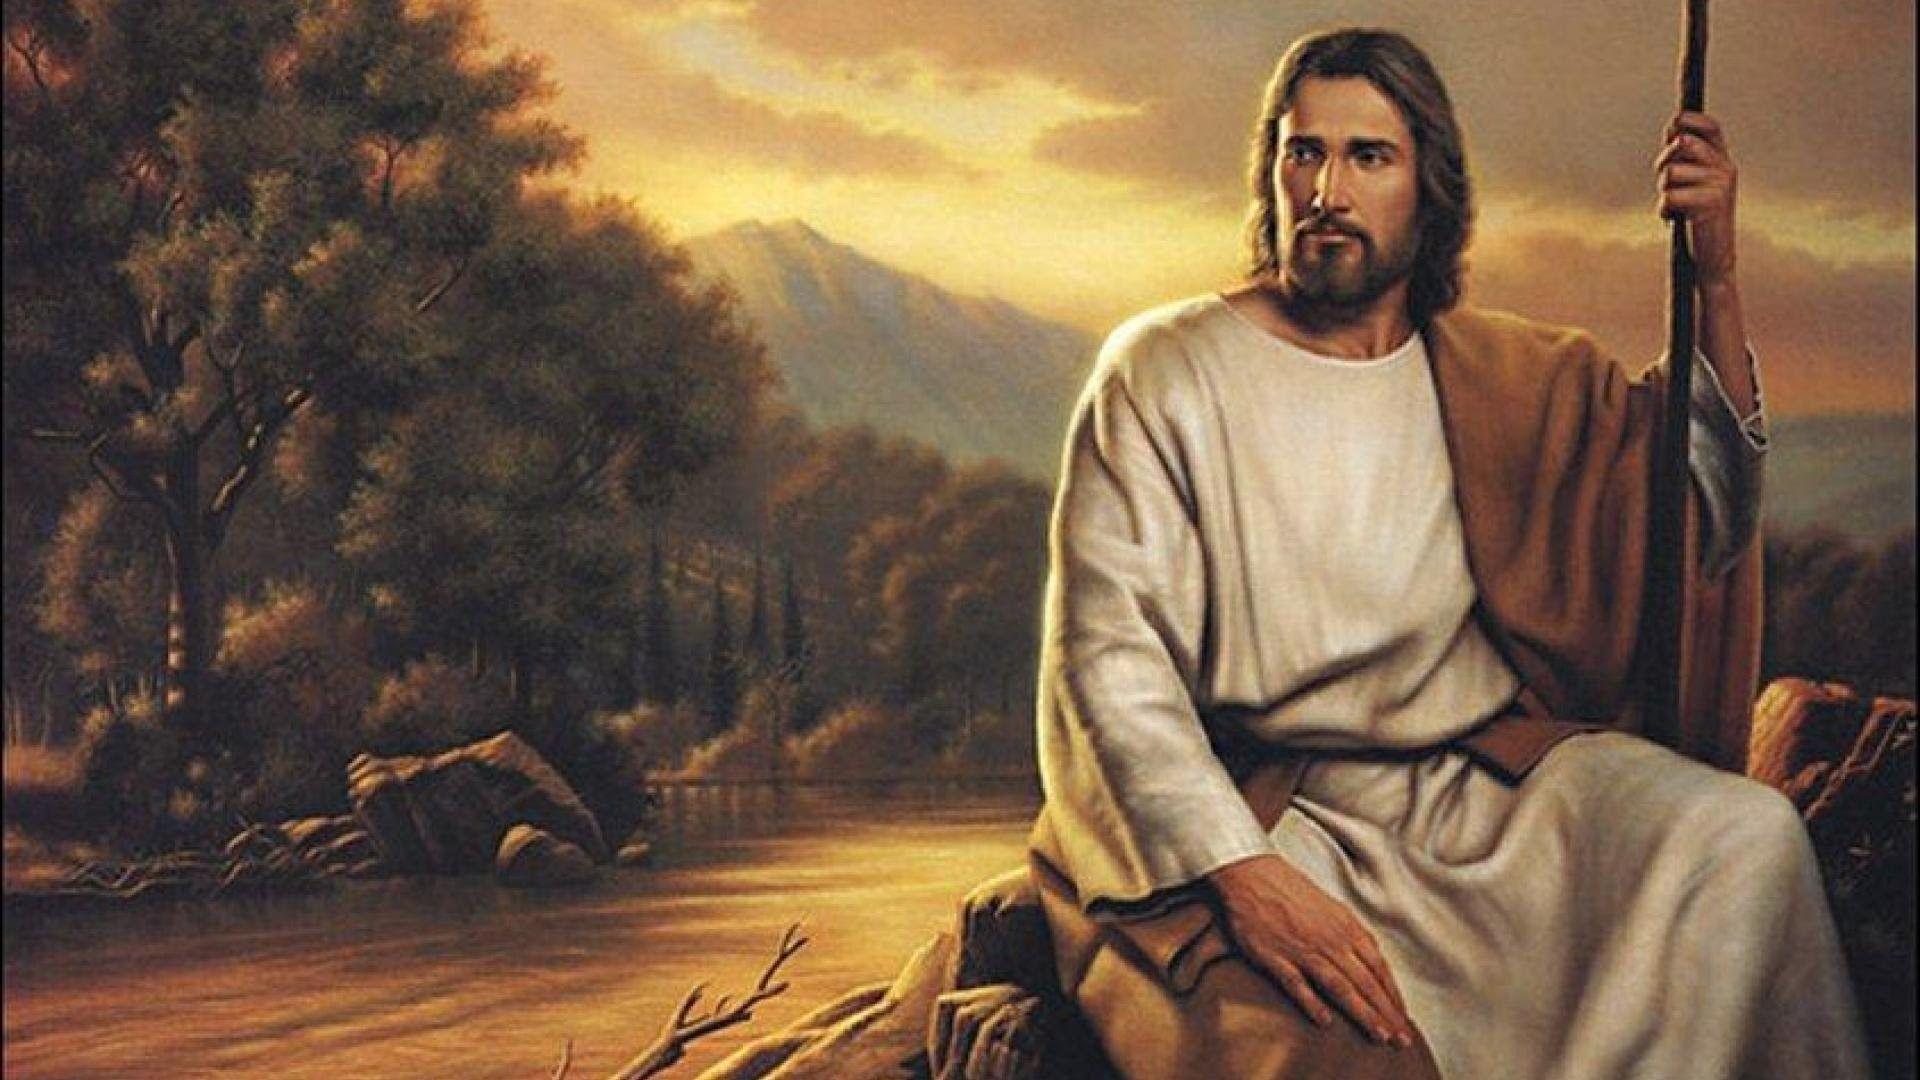 Download Image Jesus Pictures Pictures Of Christ Jesus Wallpaper